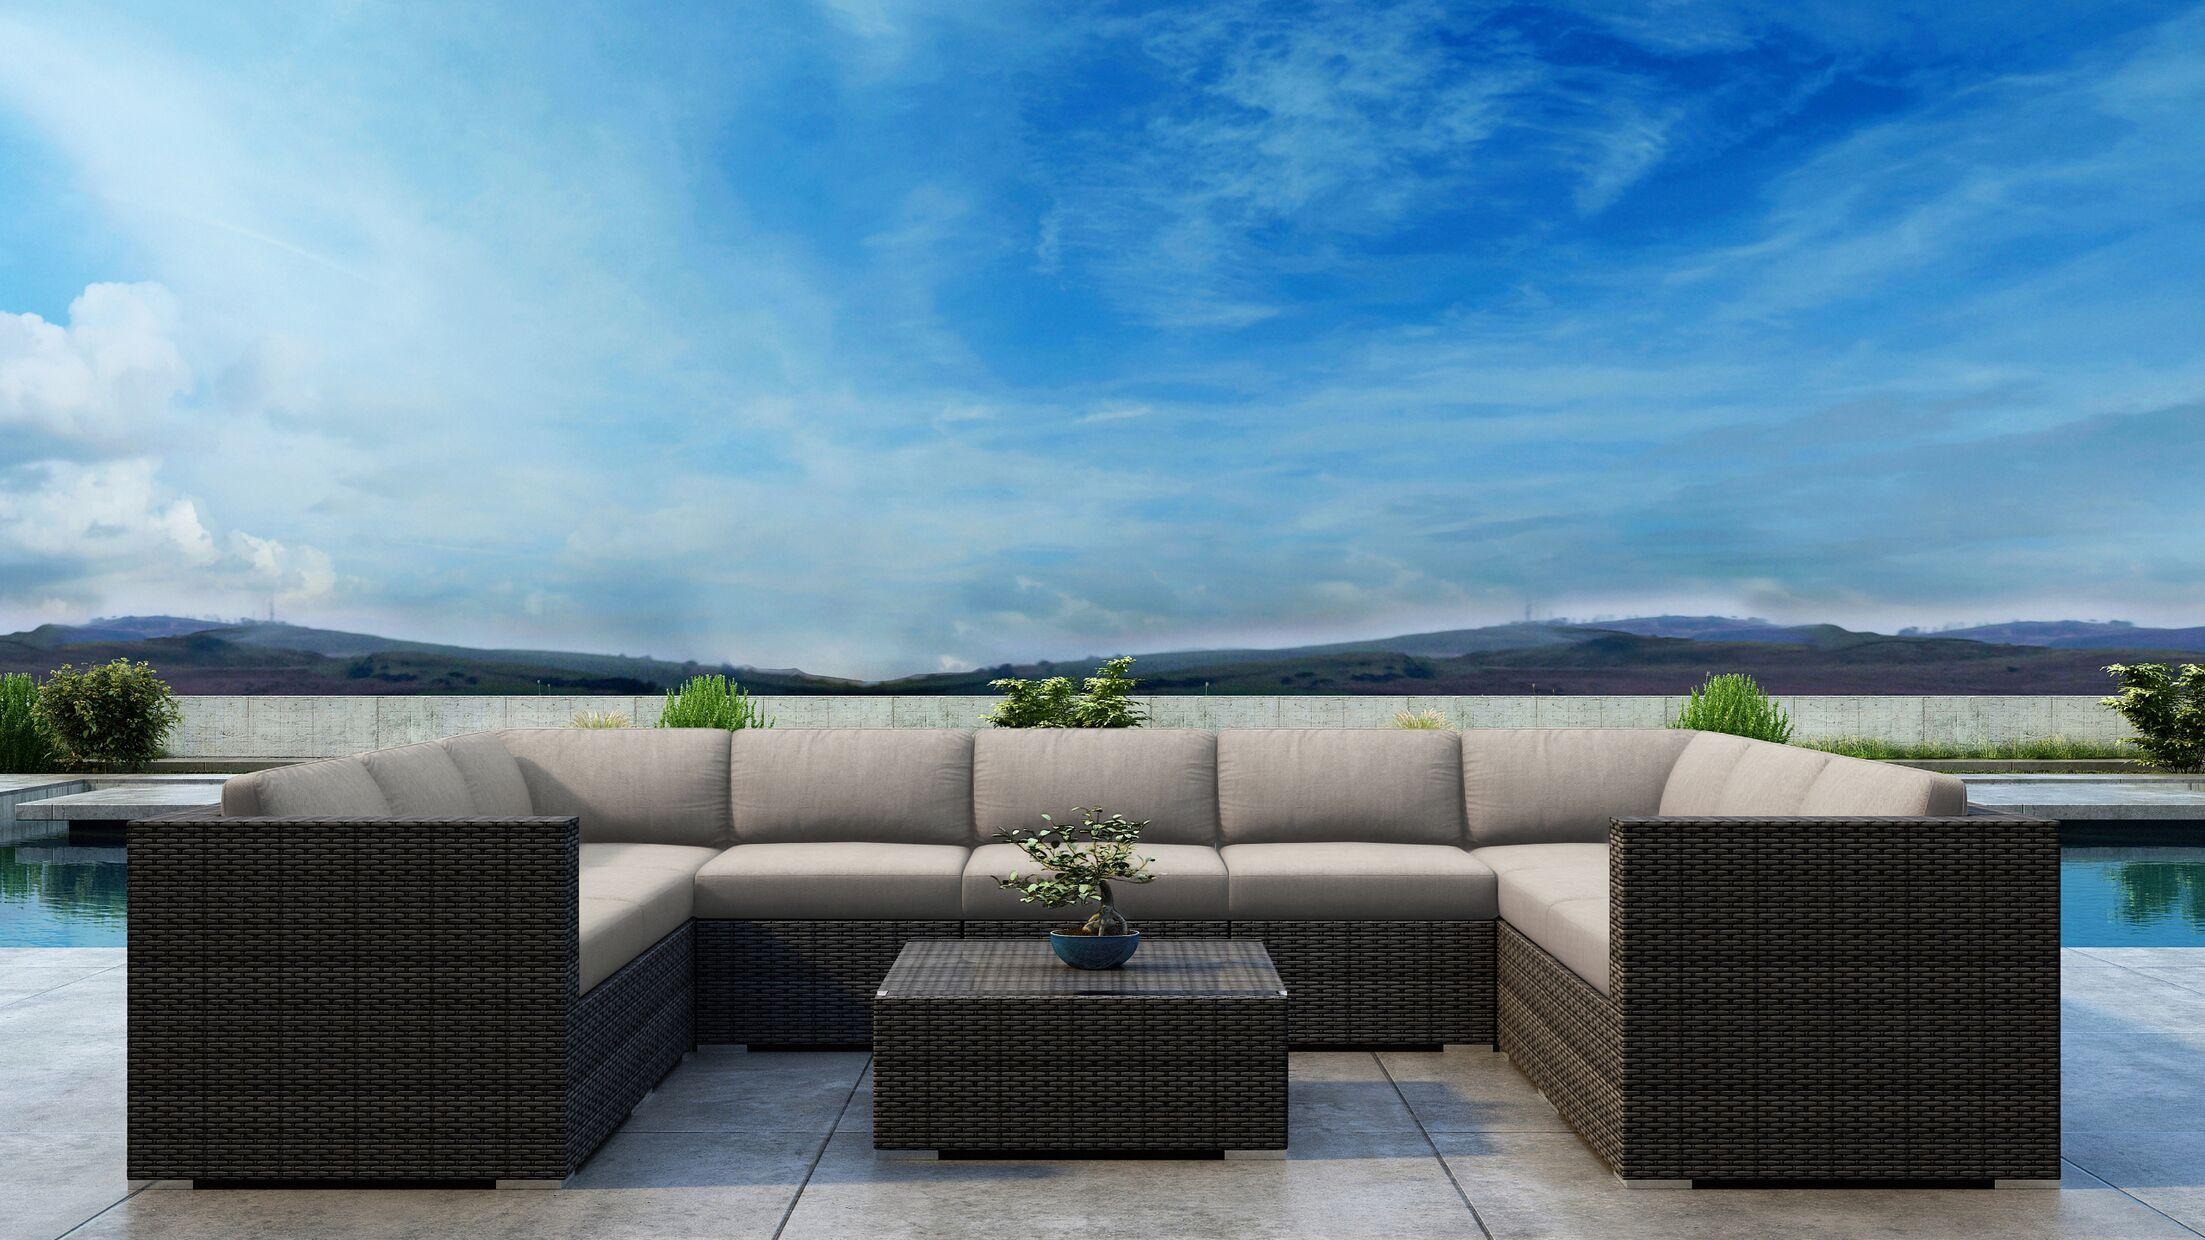 Gilleland 10 Piece Sectional Set with Sunbrella Cushion Cushion Color: Canvas Flax